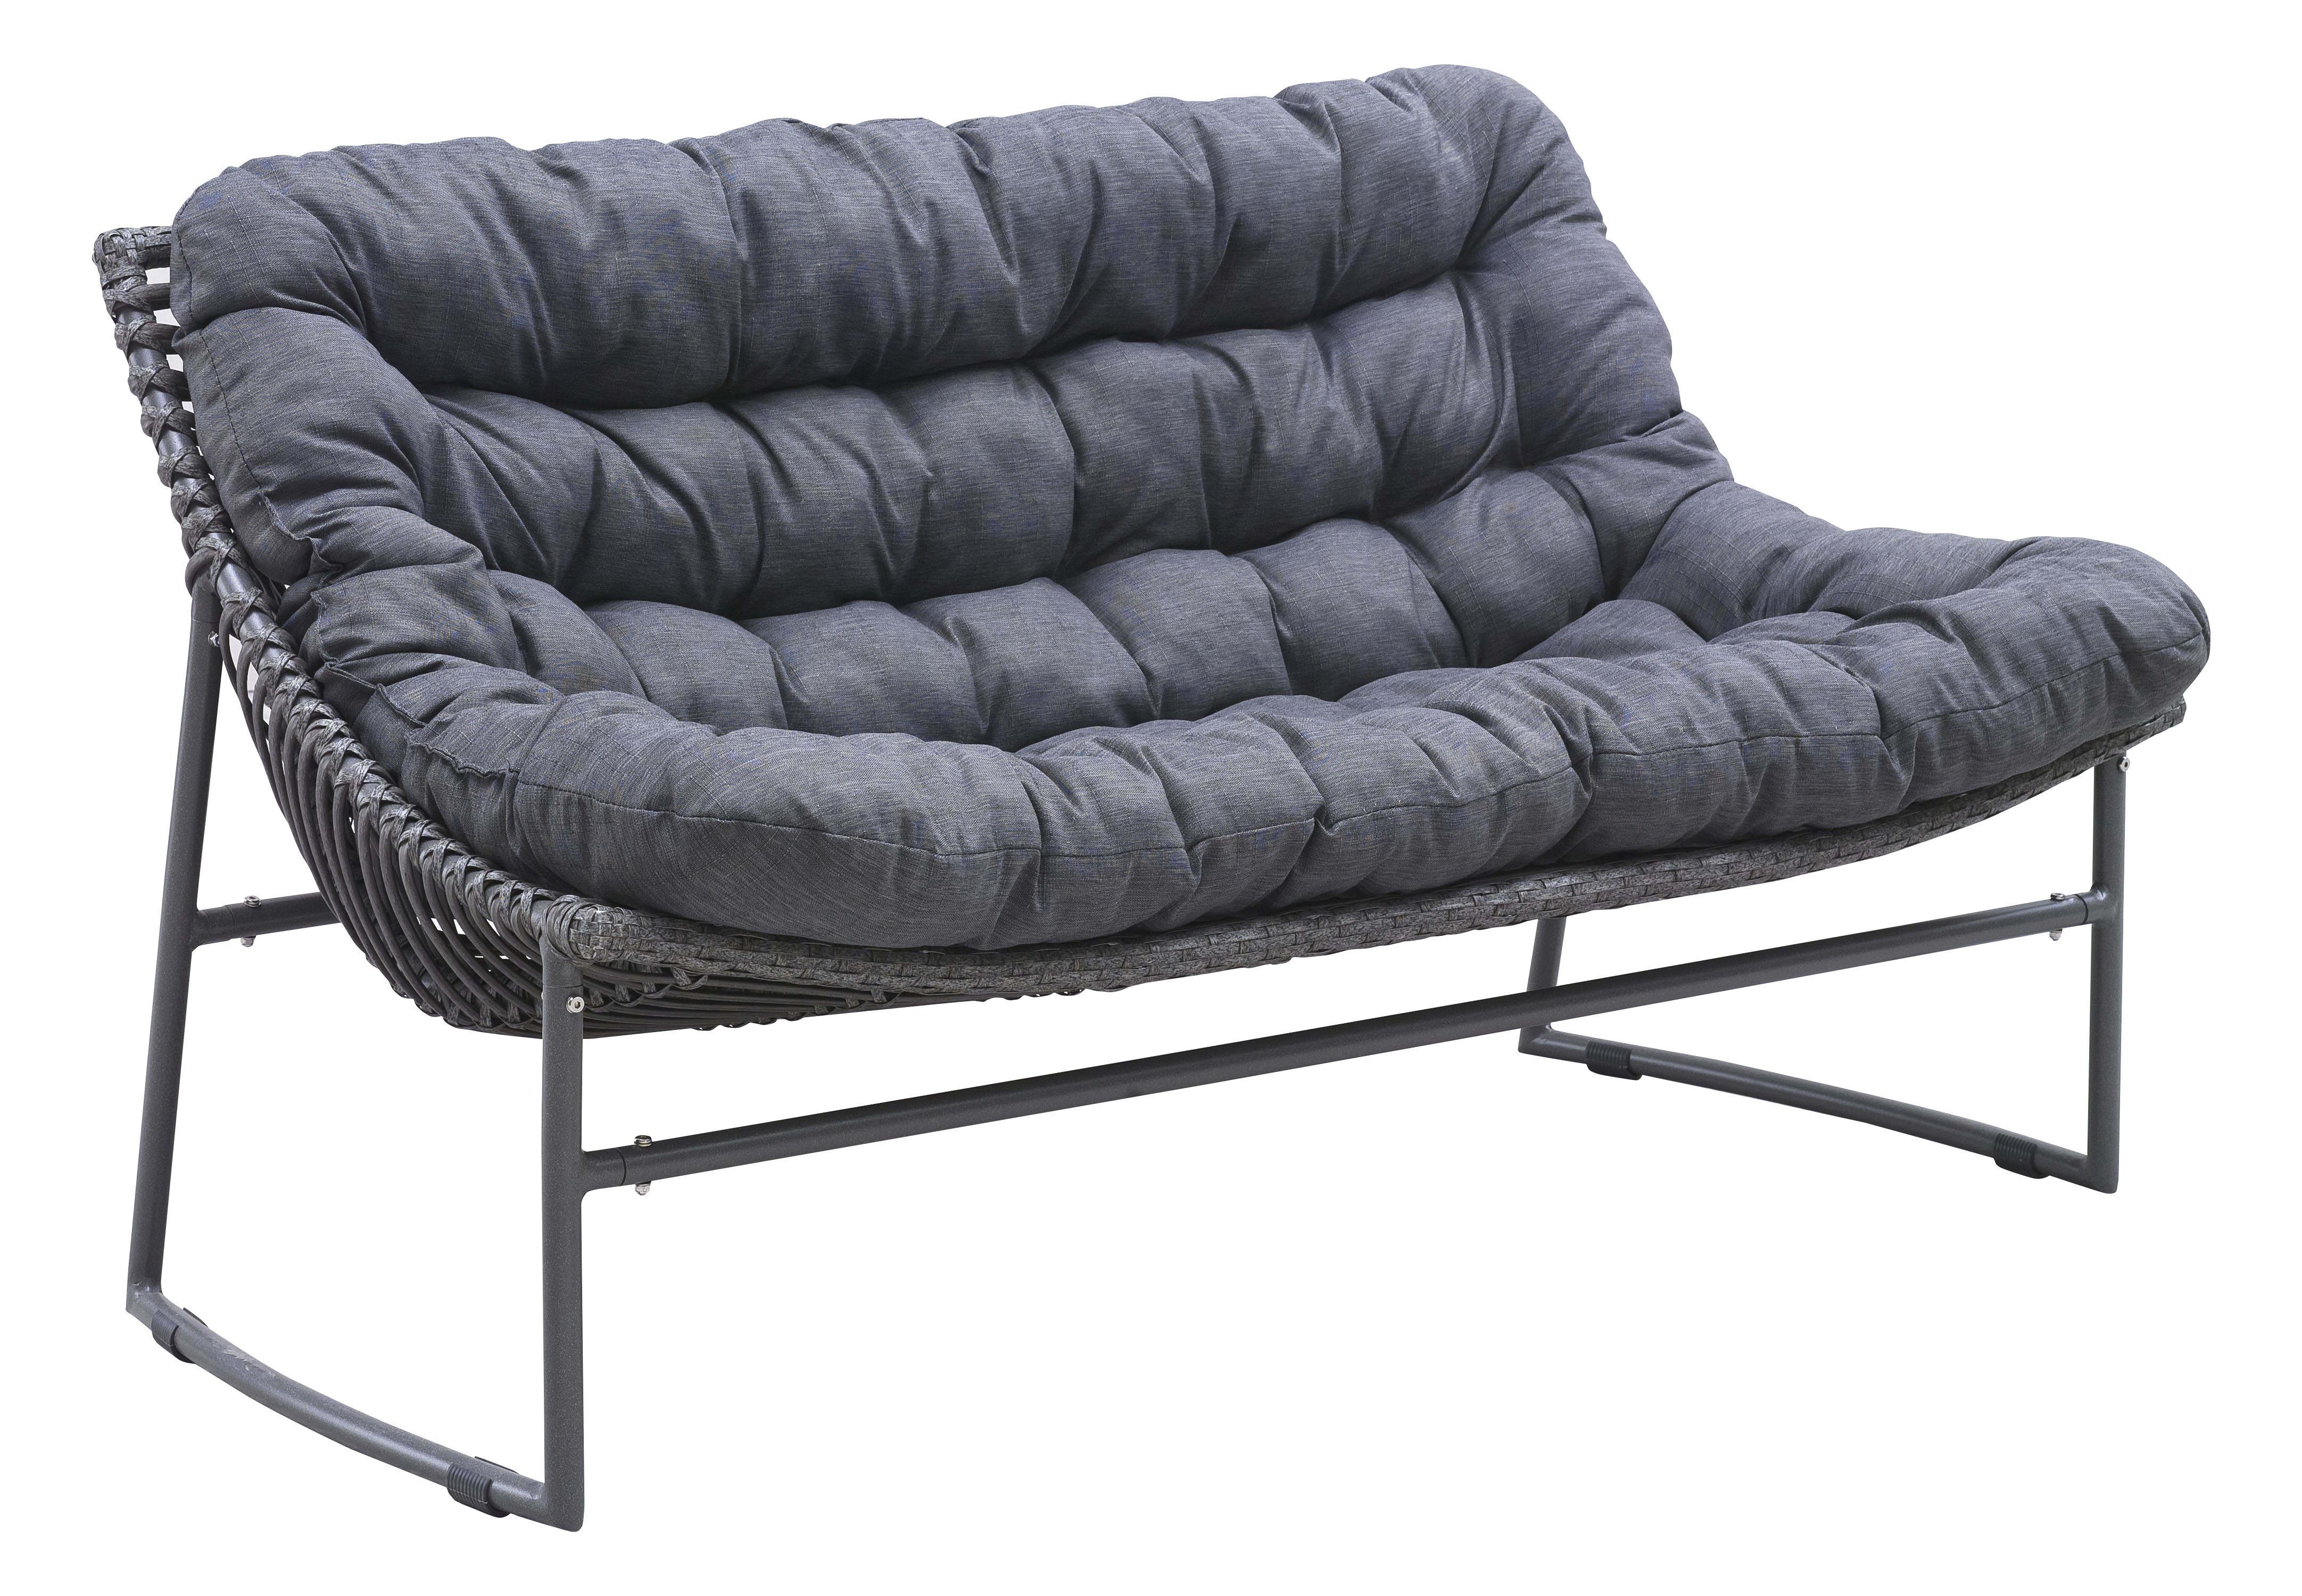 Ingonish outdoor beach sofa